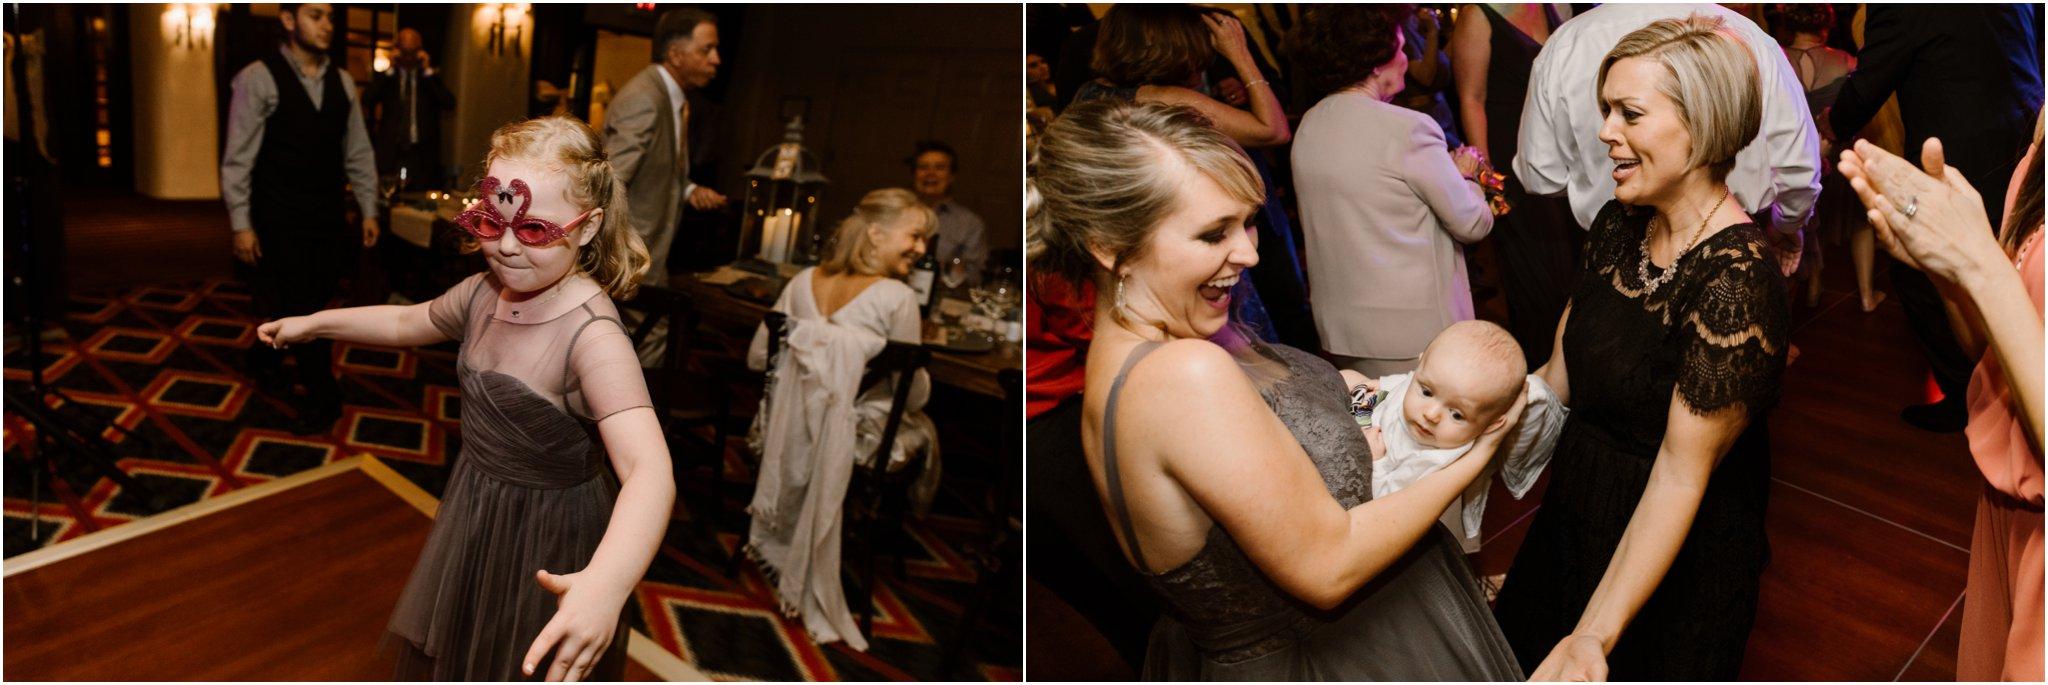 0053Santa Fe Wedding _Inn and Spa at Loretto Wedding, Inn and Spa at Loretto wedding, Santa Fe wedding photographers, blue rose photography